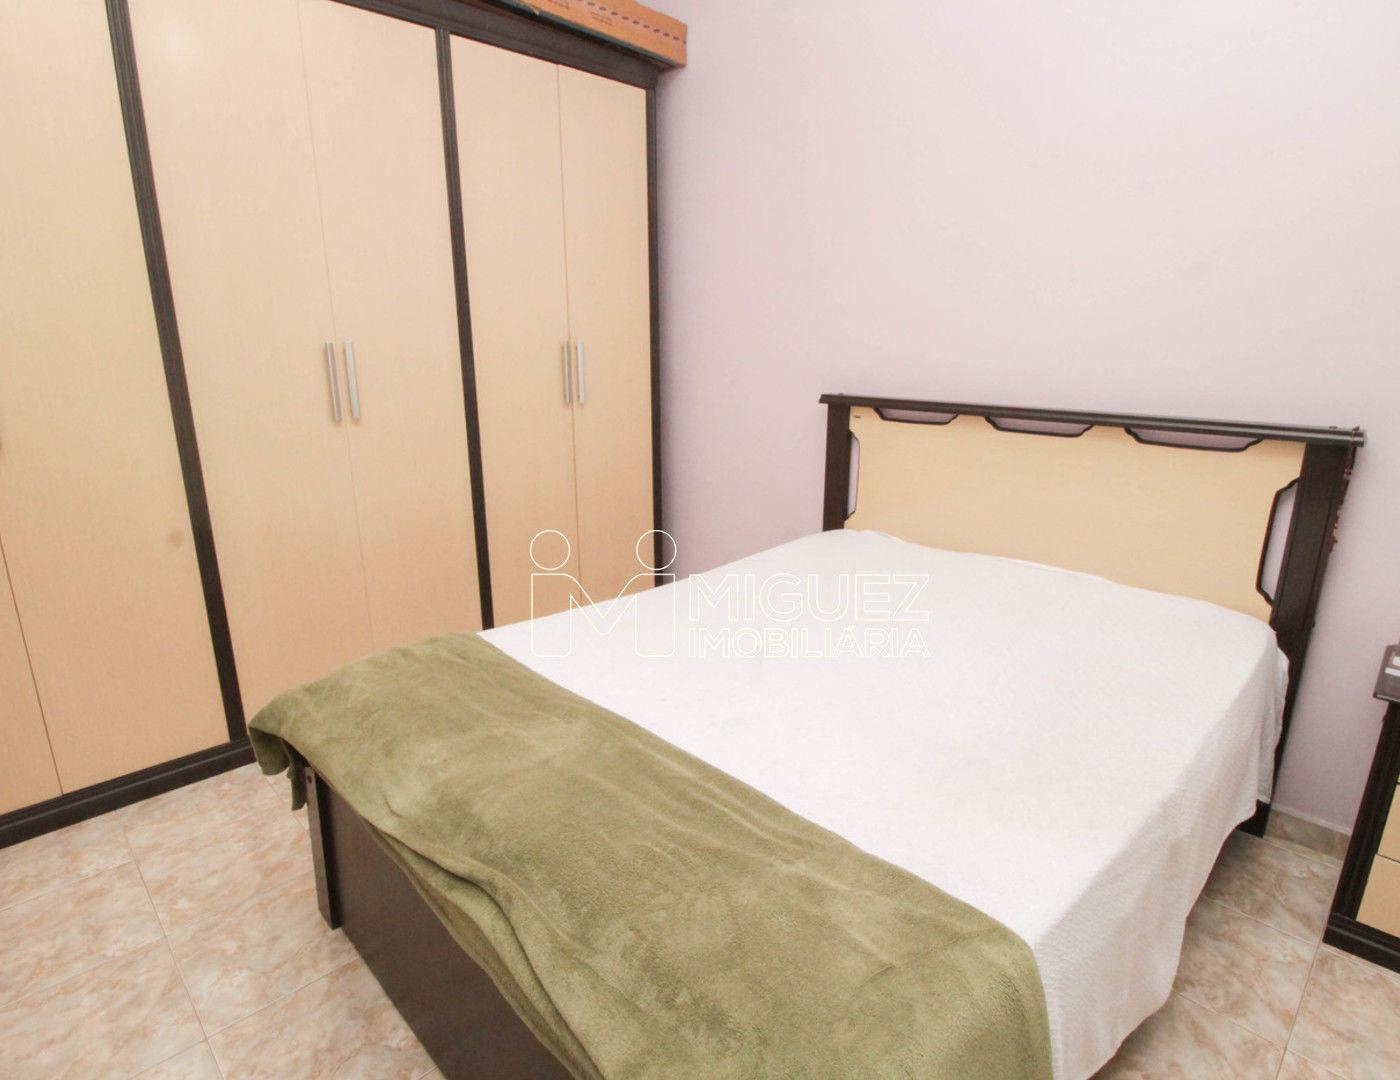 Apartamento, venda, Rua Dona Delfina - Tijuca , Rio de janeiro